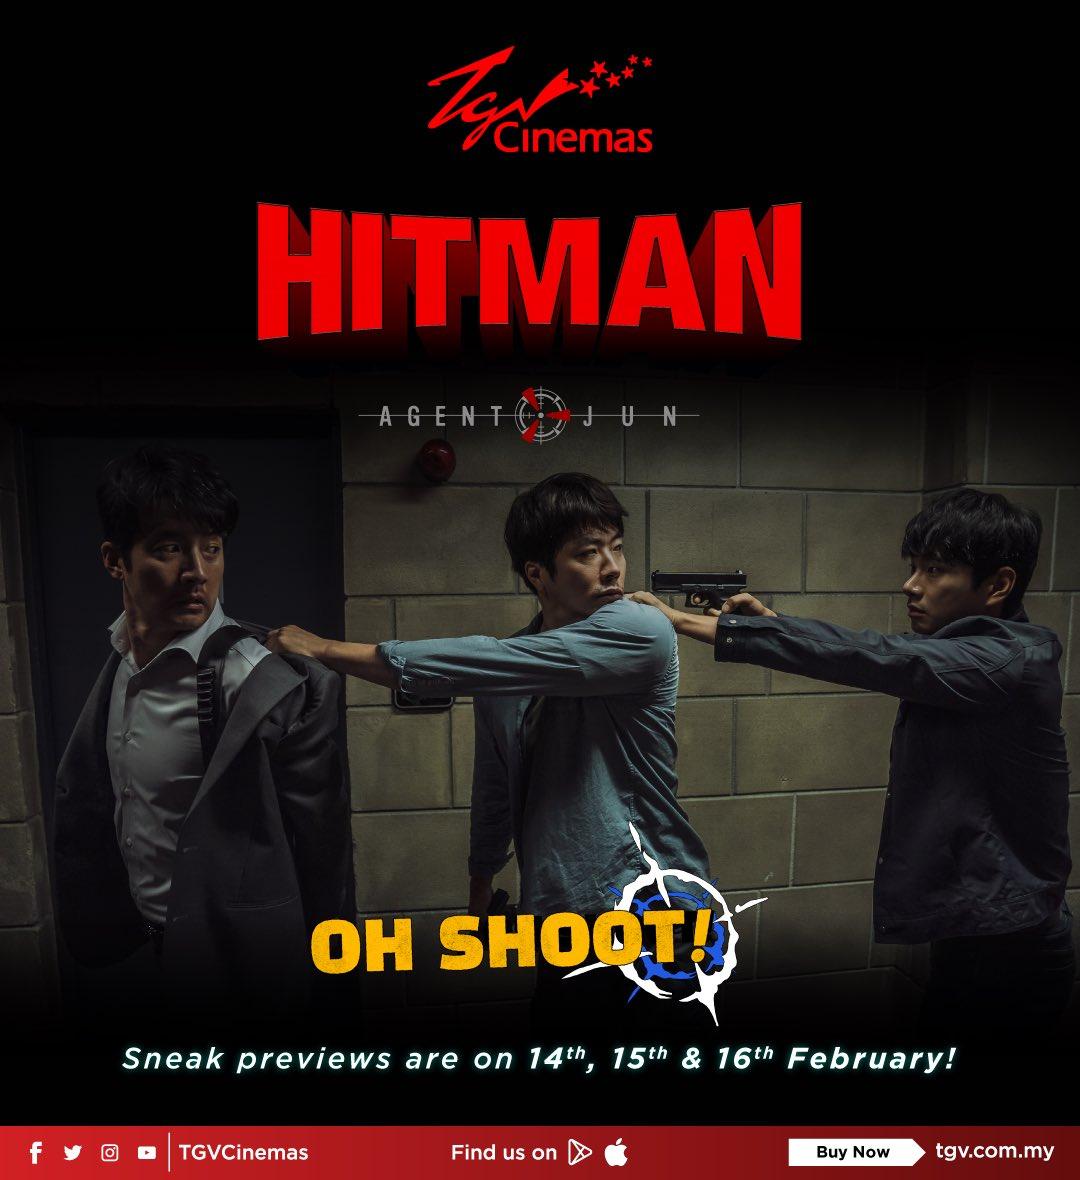 Tgv Cinemas On Twitter Oh Shoot Hitman Agent Jun 히트맨 Sneaks